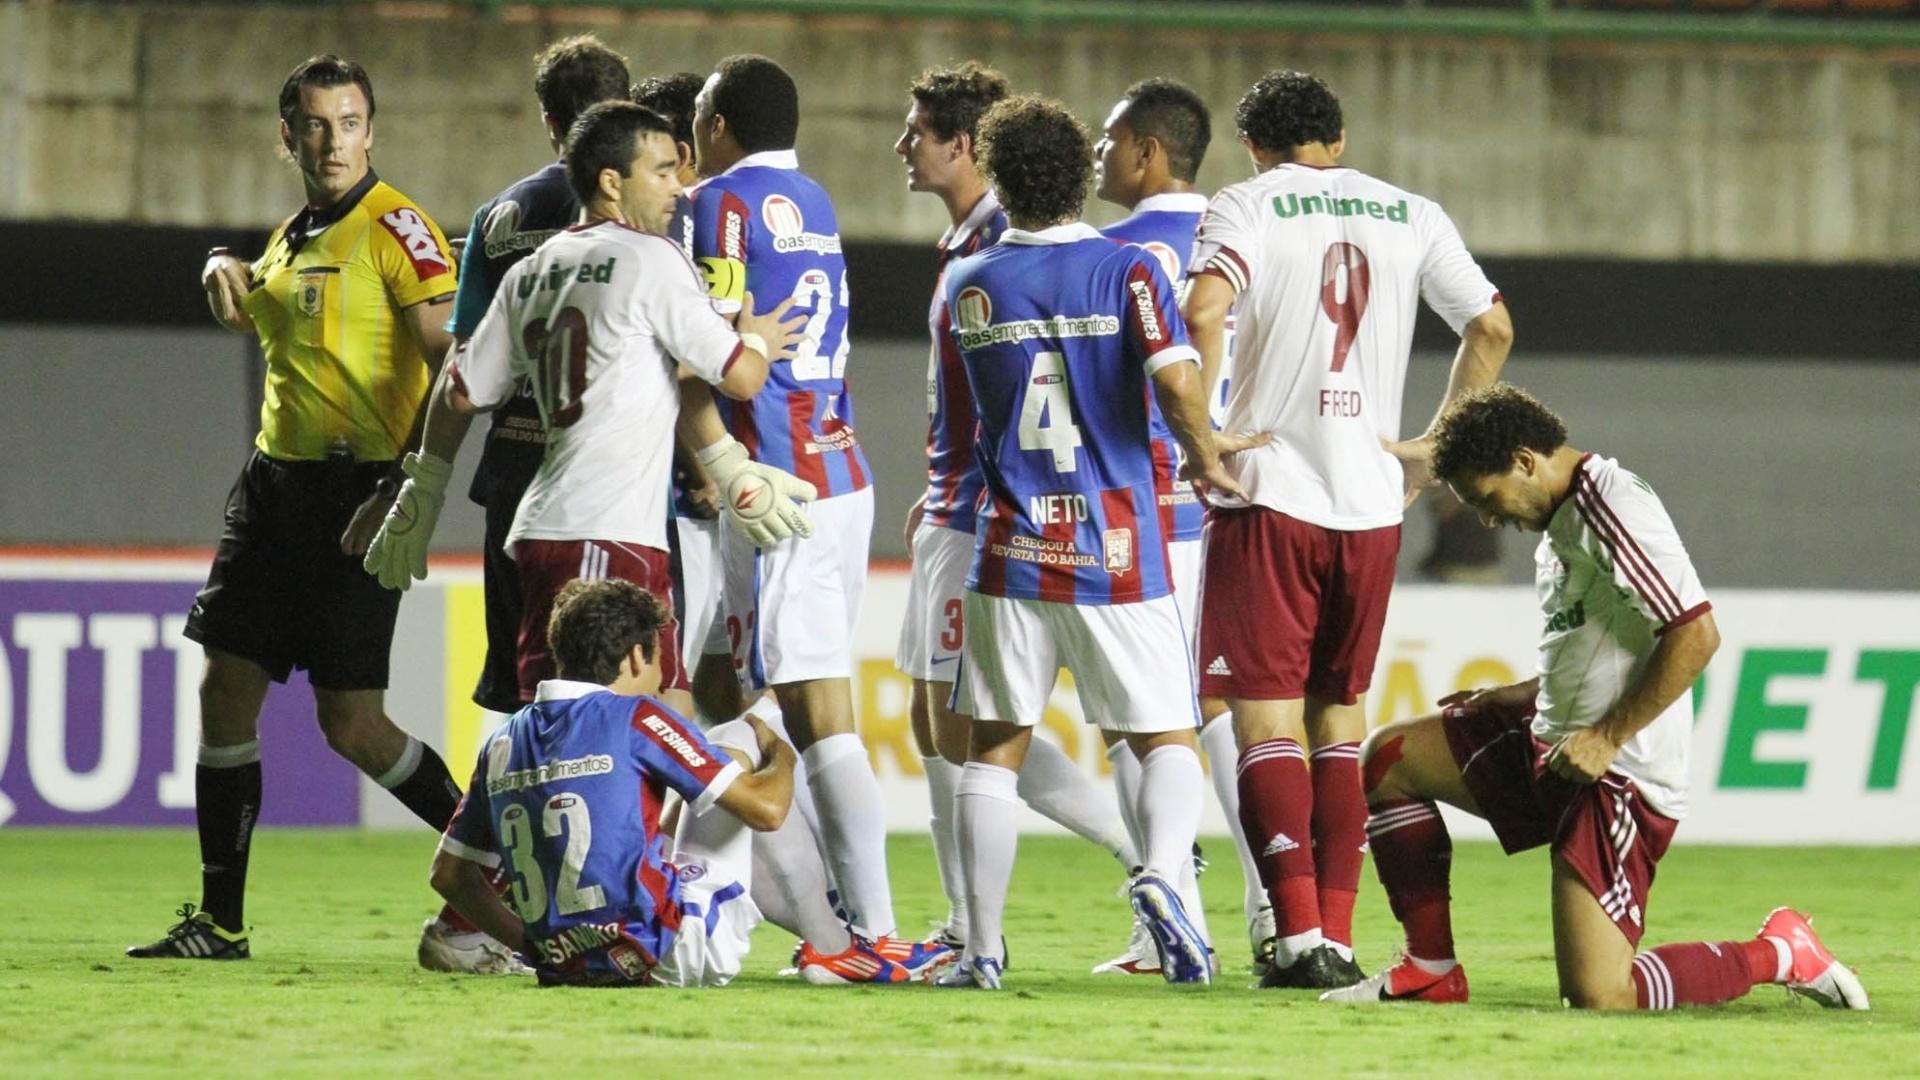 Jogadores do Bahia reclamam com árbitro durante partida contra o Fluminense